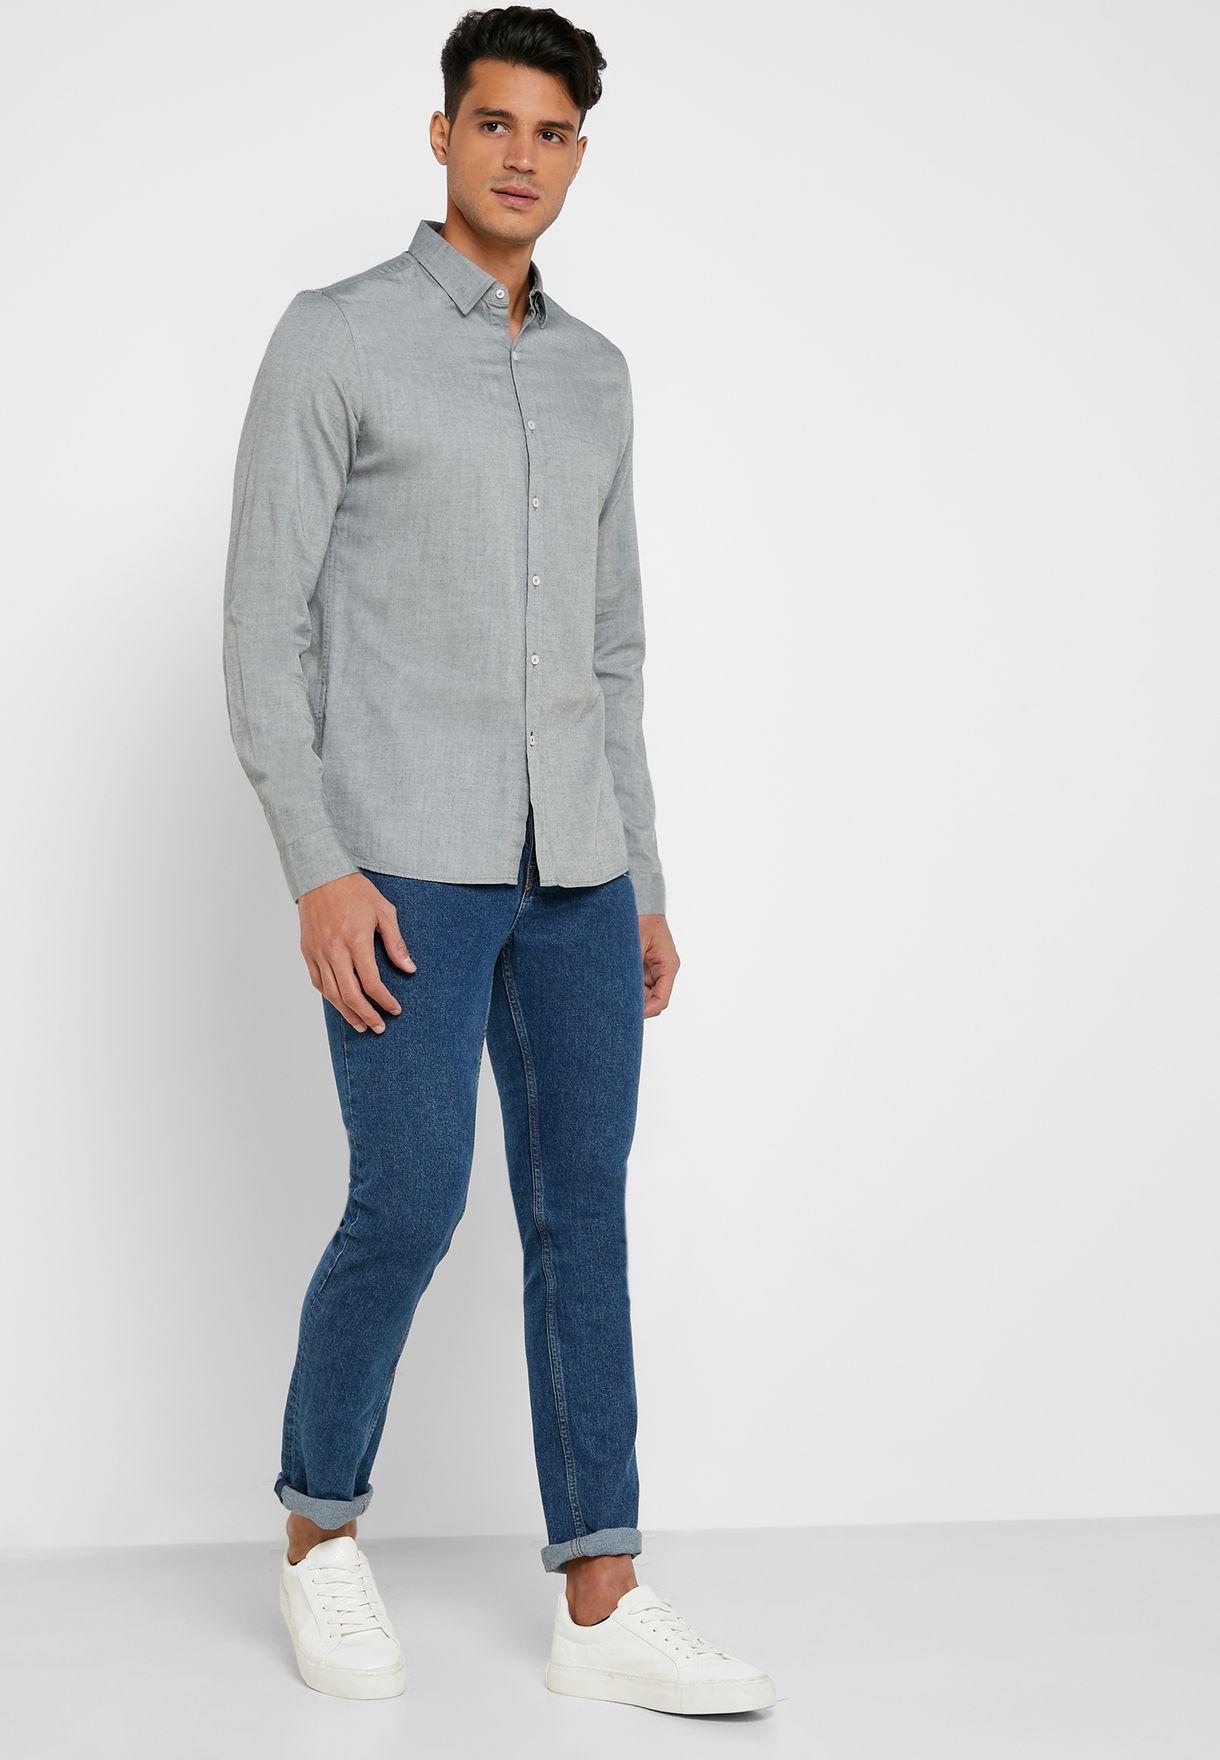 Model Slim Fit Shirt